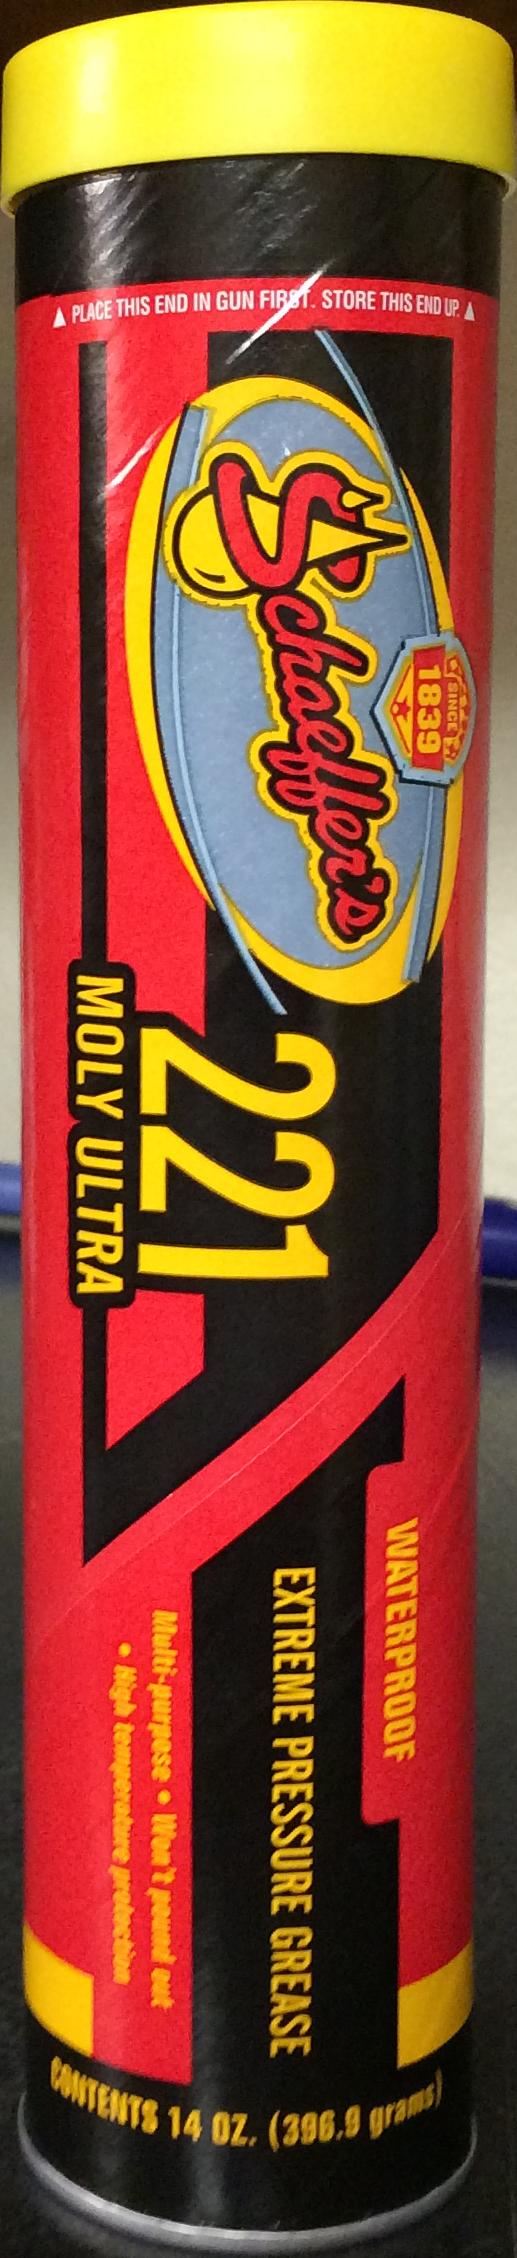 221-1-1tube.png